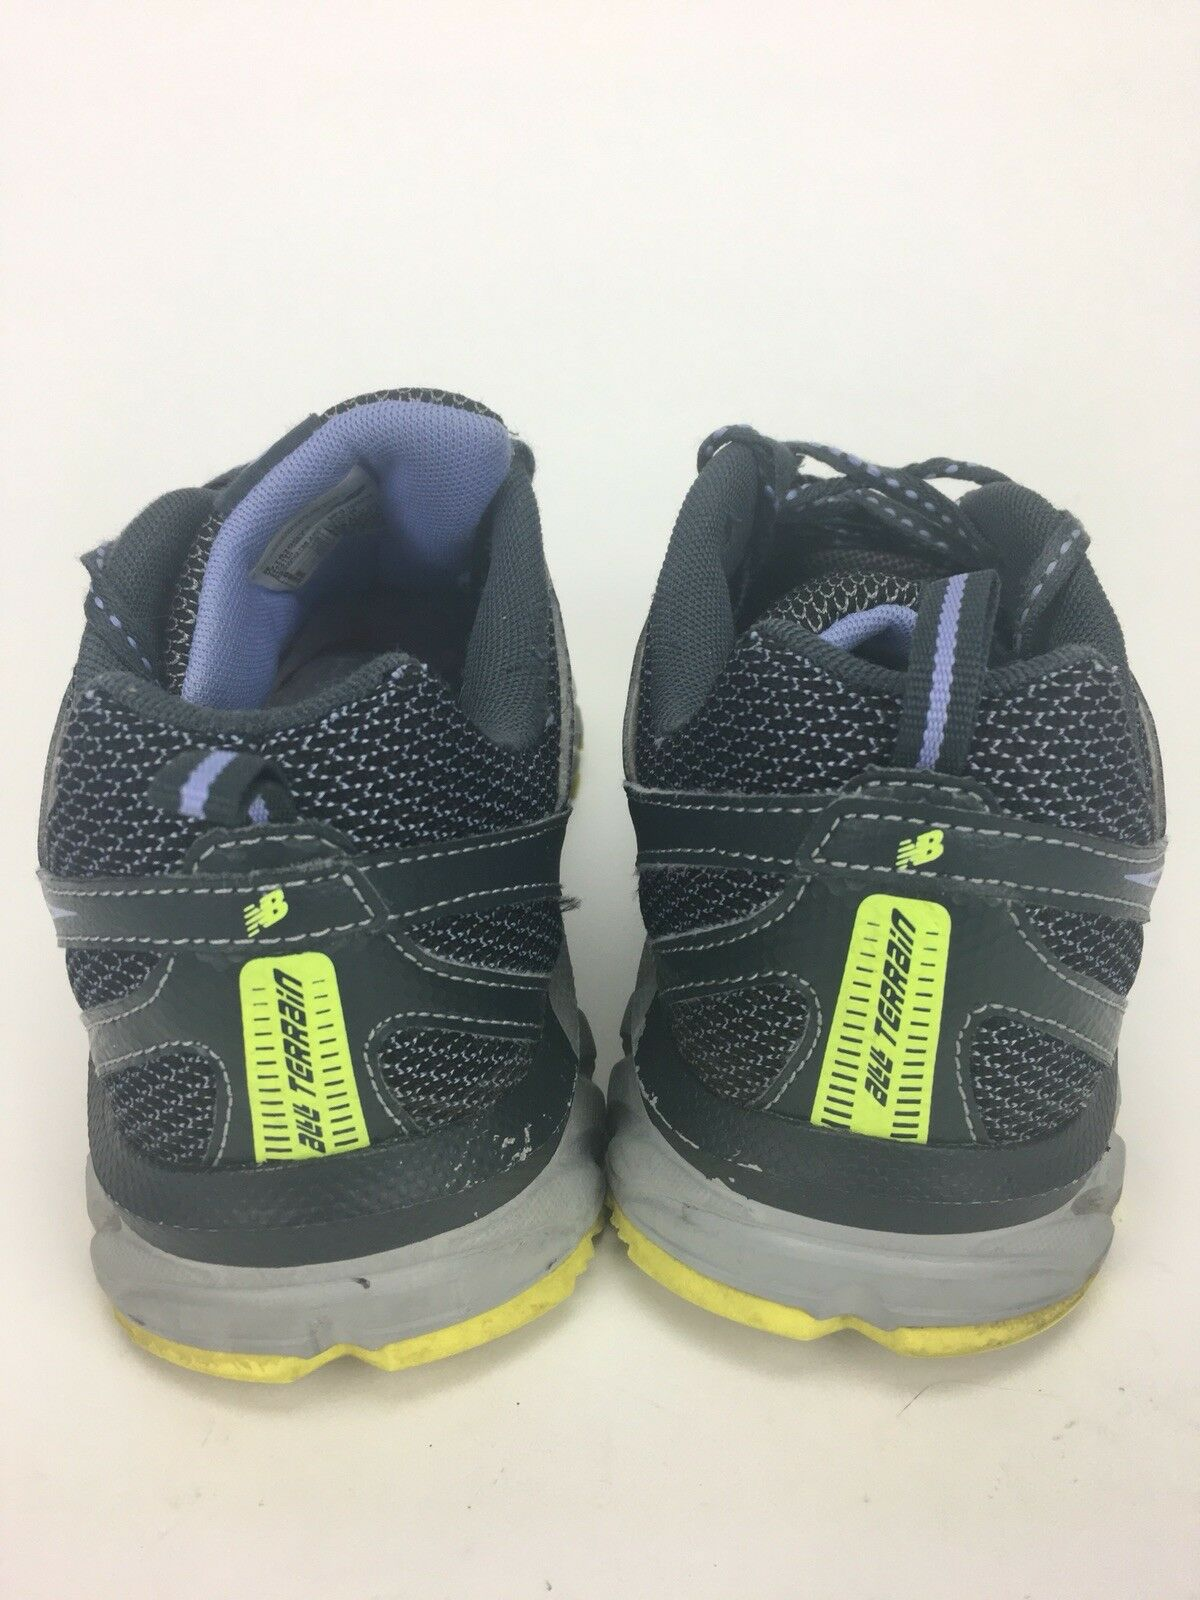 NEW Running BALANCE Damenschuhe Sz 8 39 610v4 WT610GY4 Training Running NEW Schuhes Gray/Purple de64f5